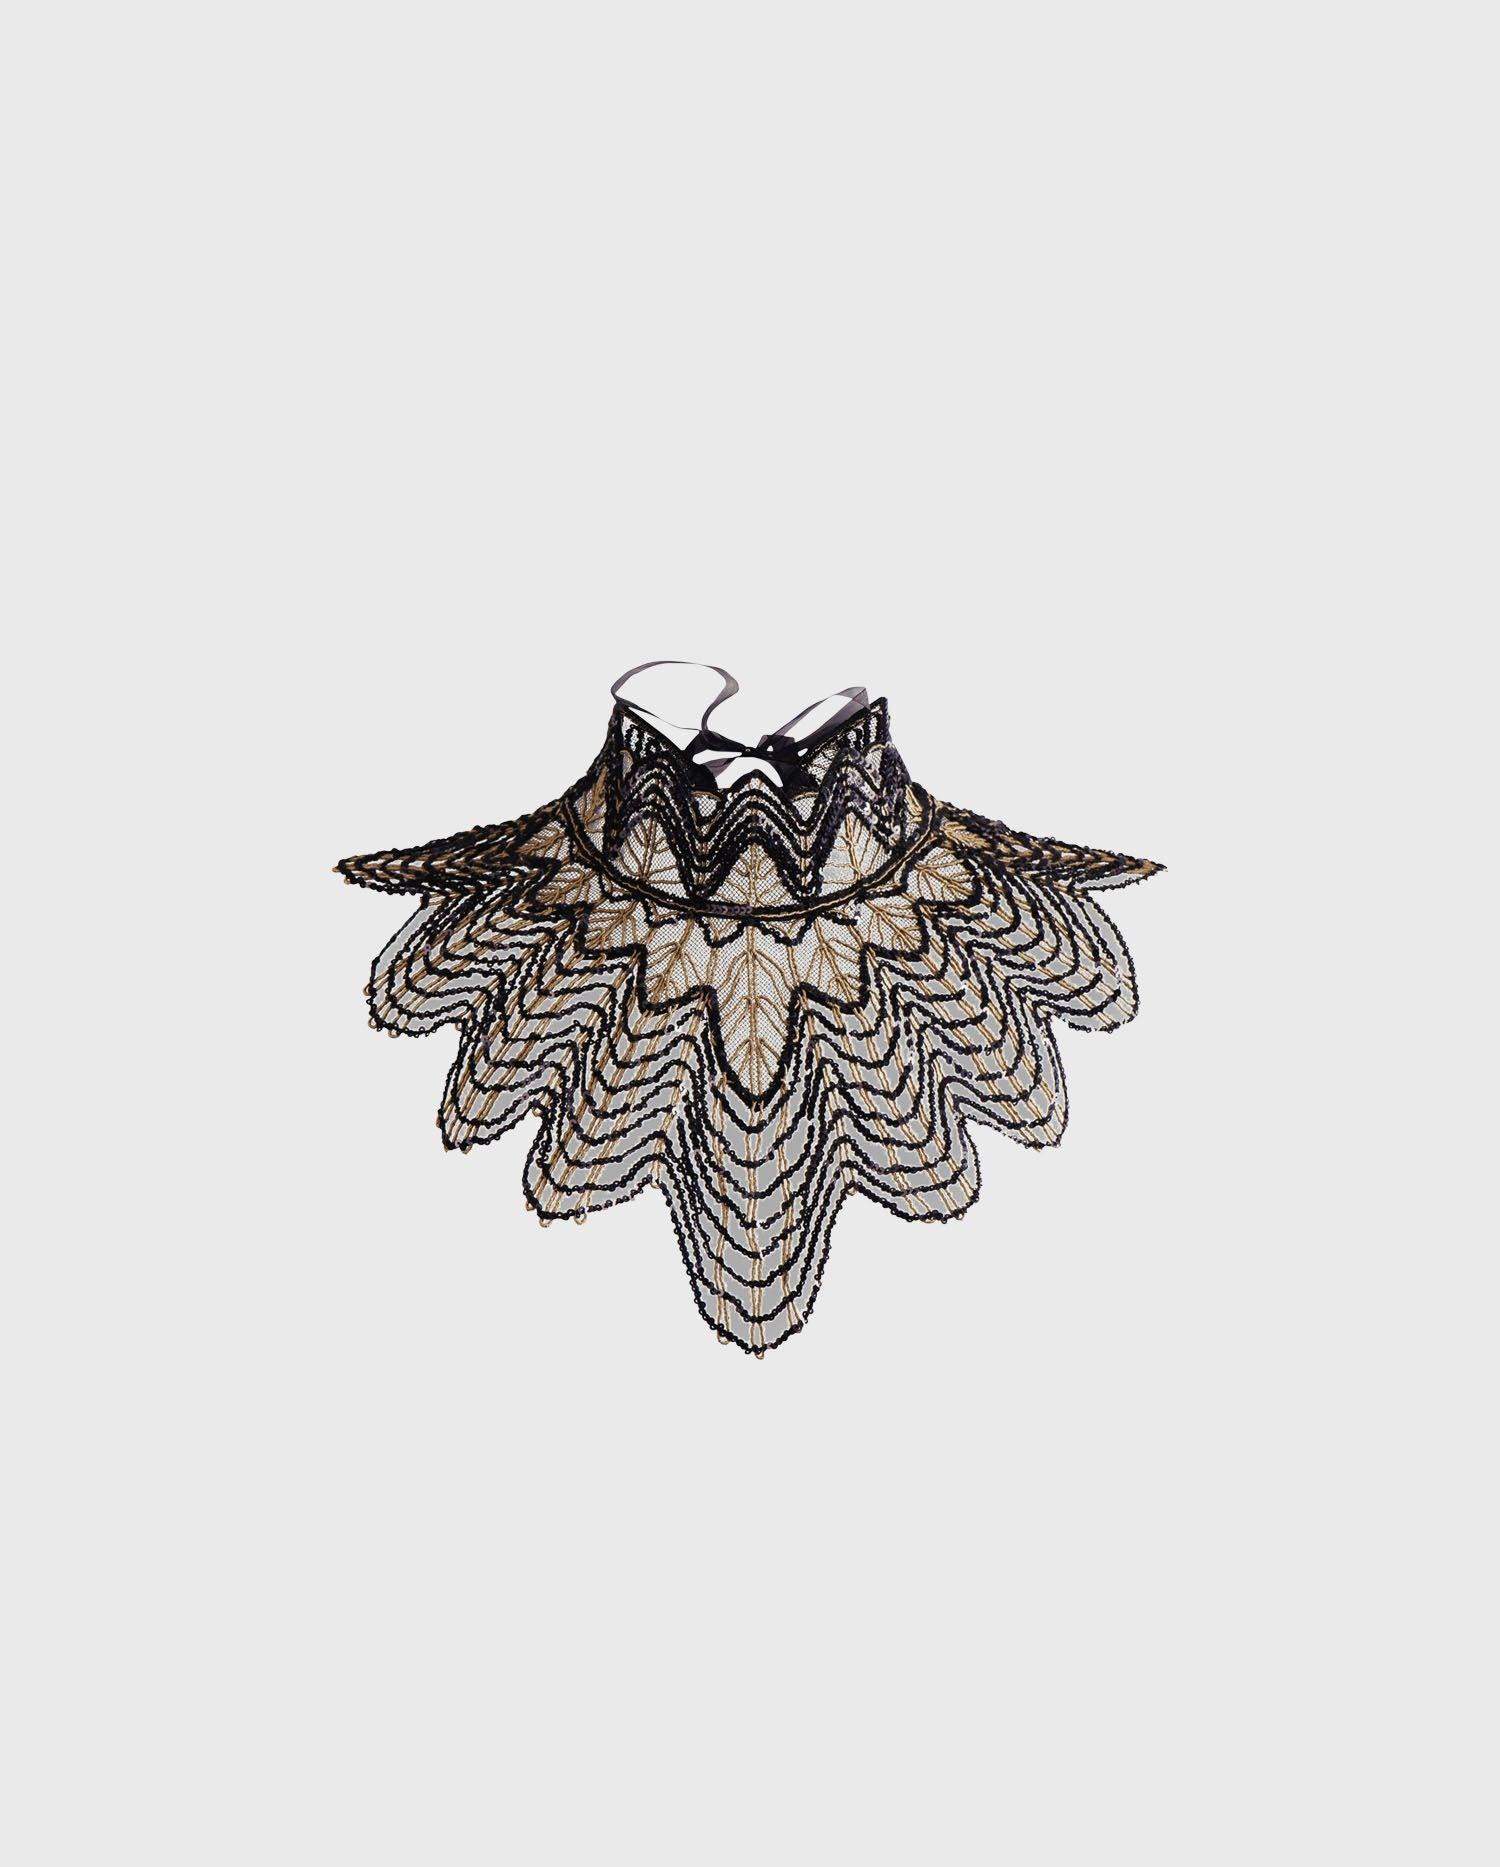 ANNE FONTAINE Fabie Collar: Sequin detailed handmade mesh collar